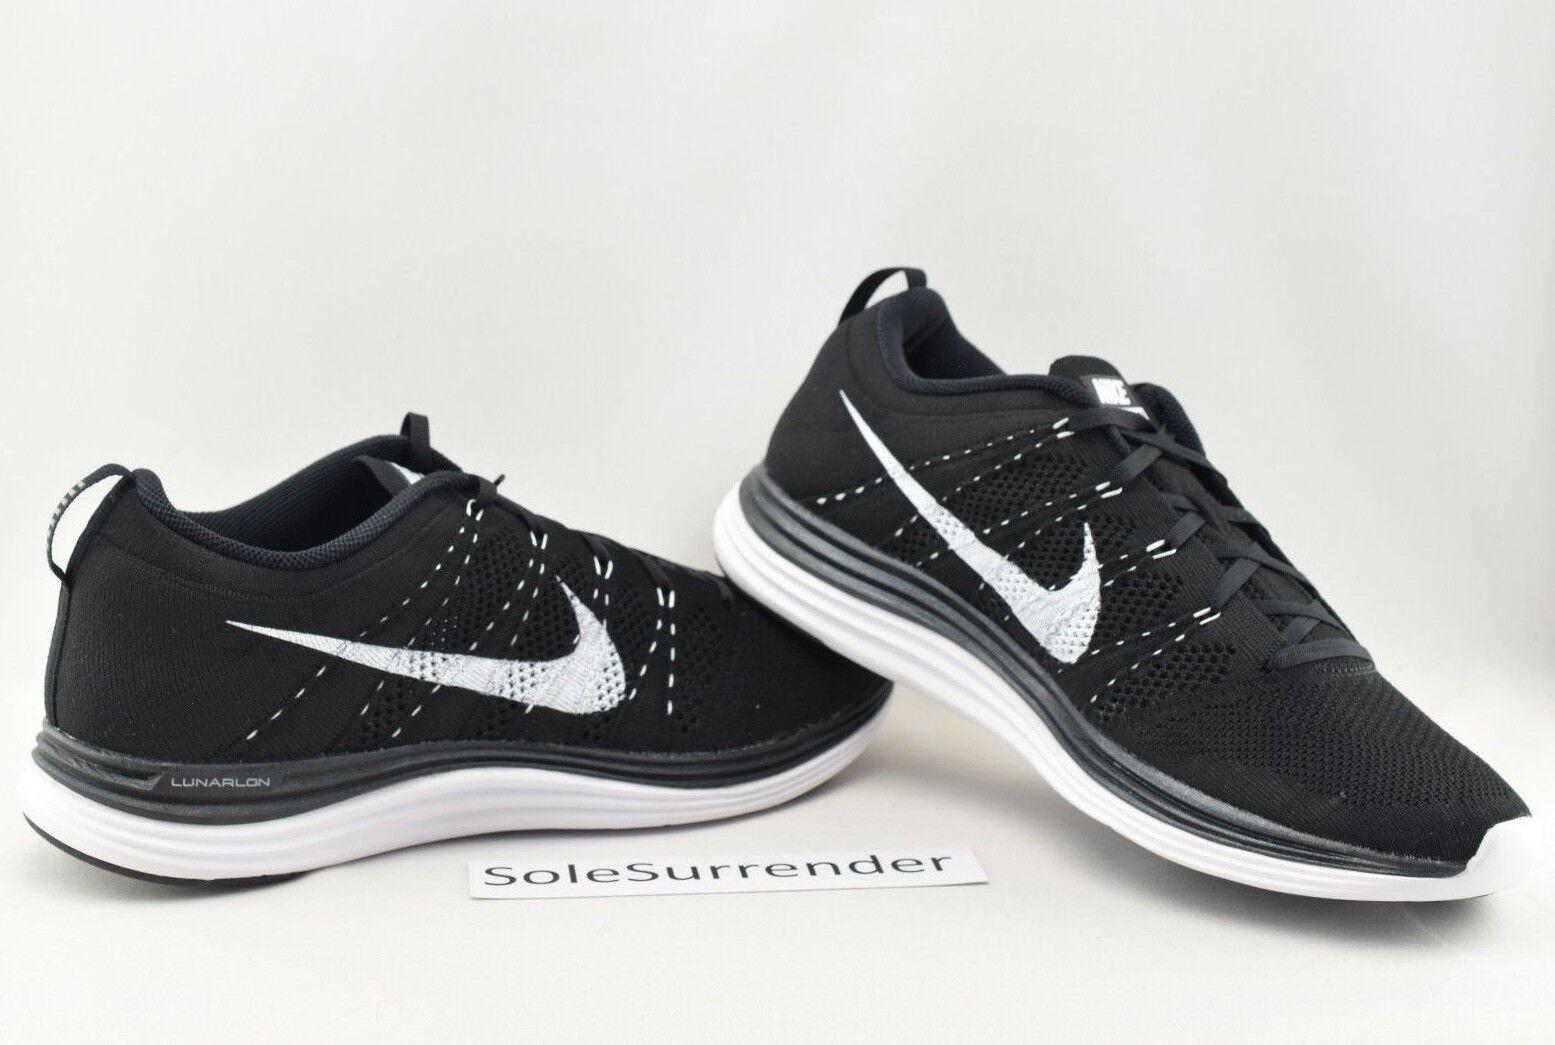 Nike Flyknit Lunar1+ - SIZE 11.5 - 554887-011 White Lunar 1 Black Retro OG Low